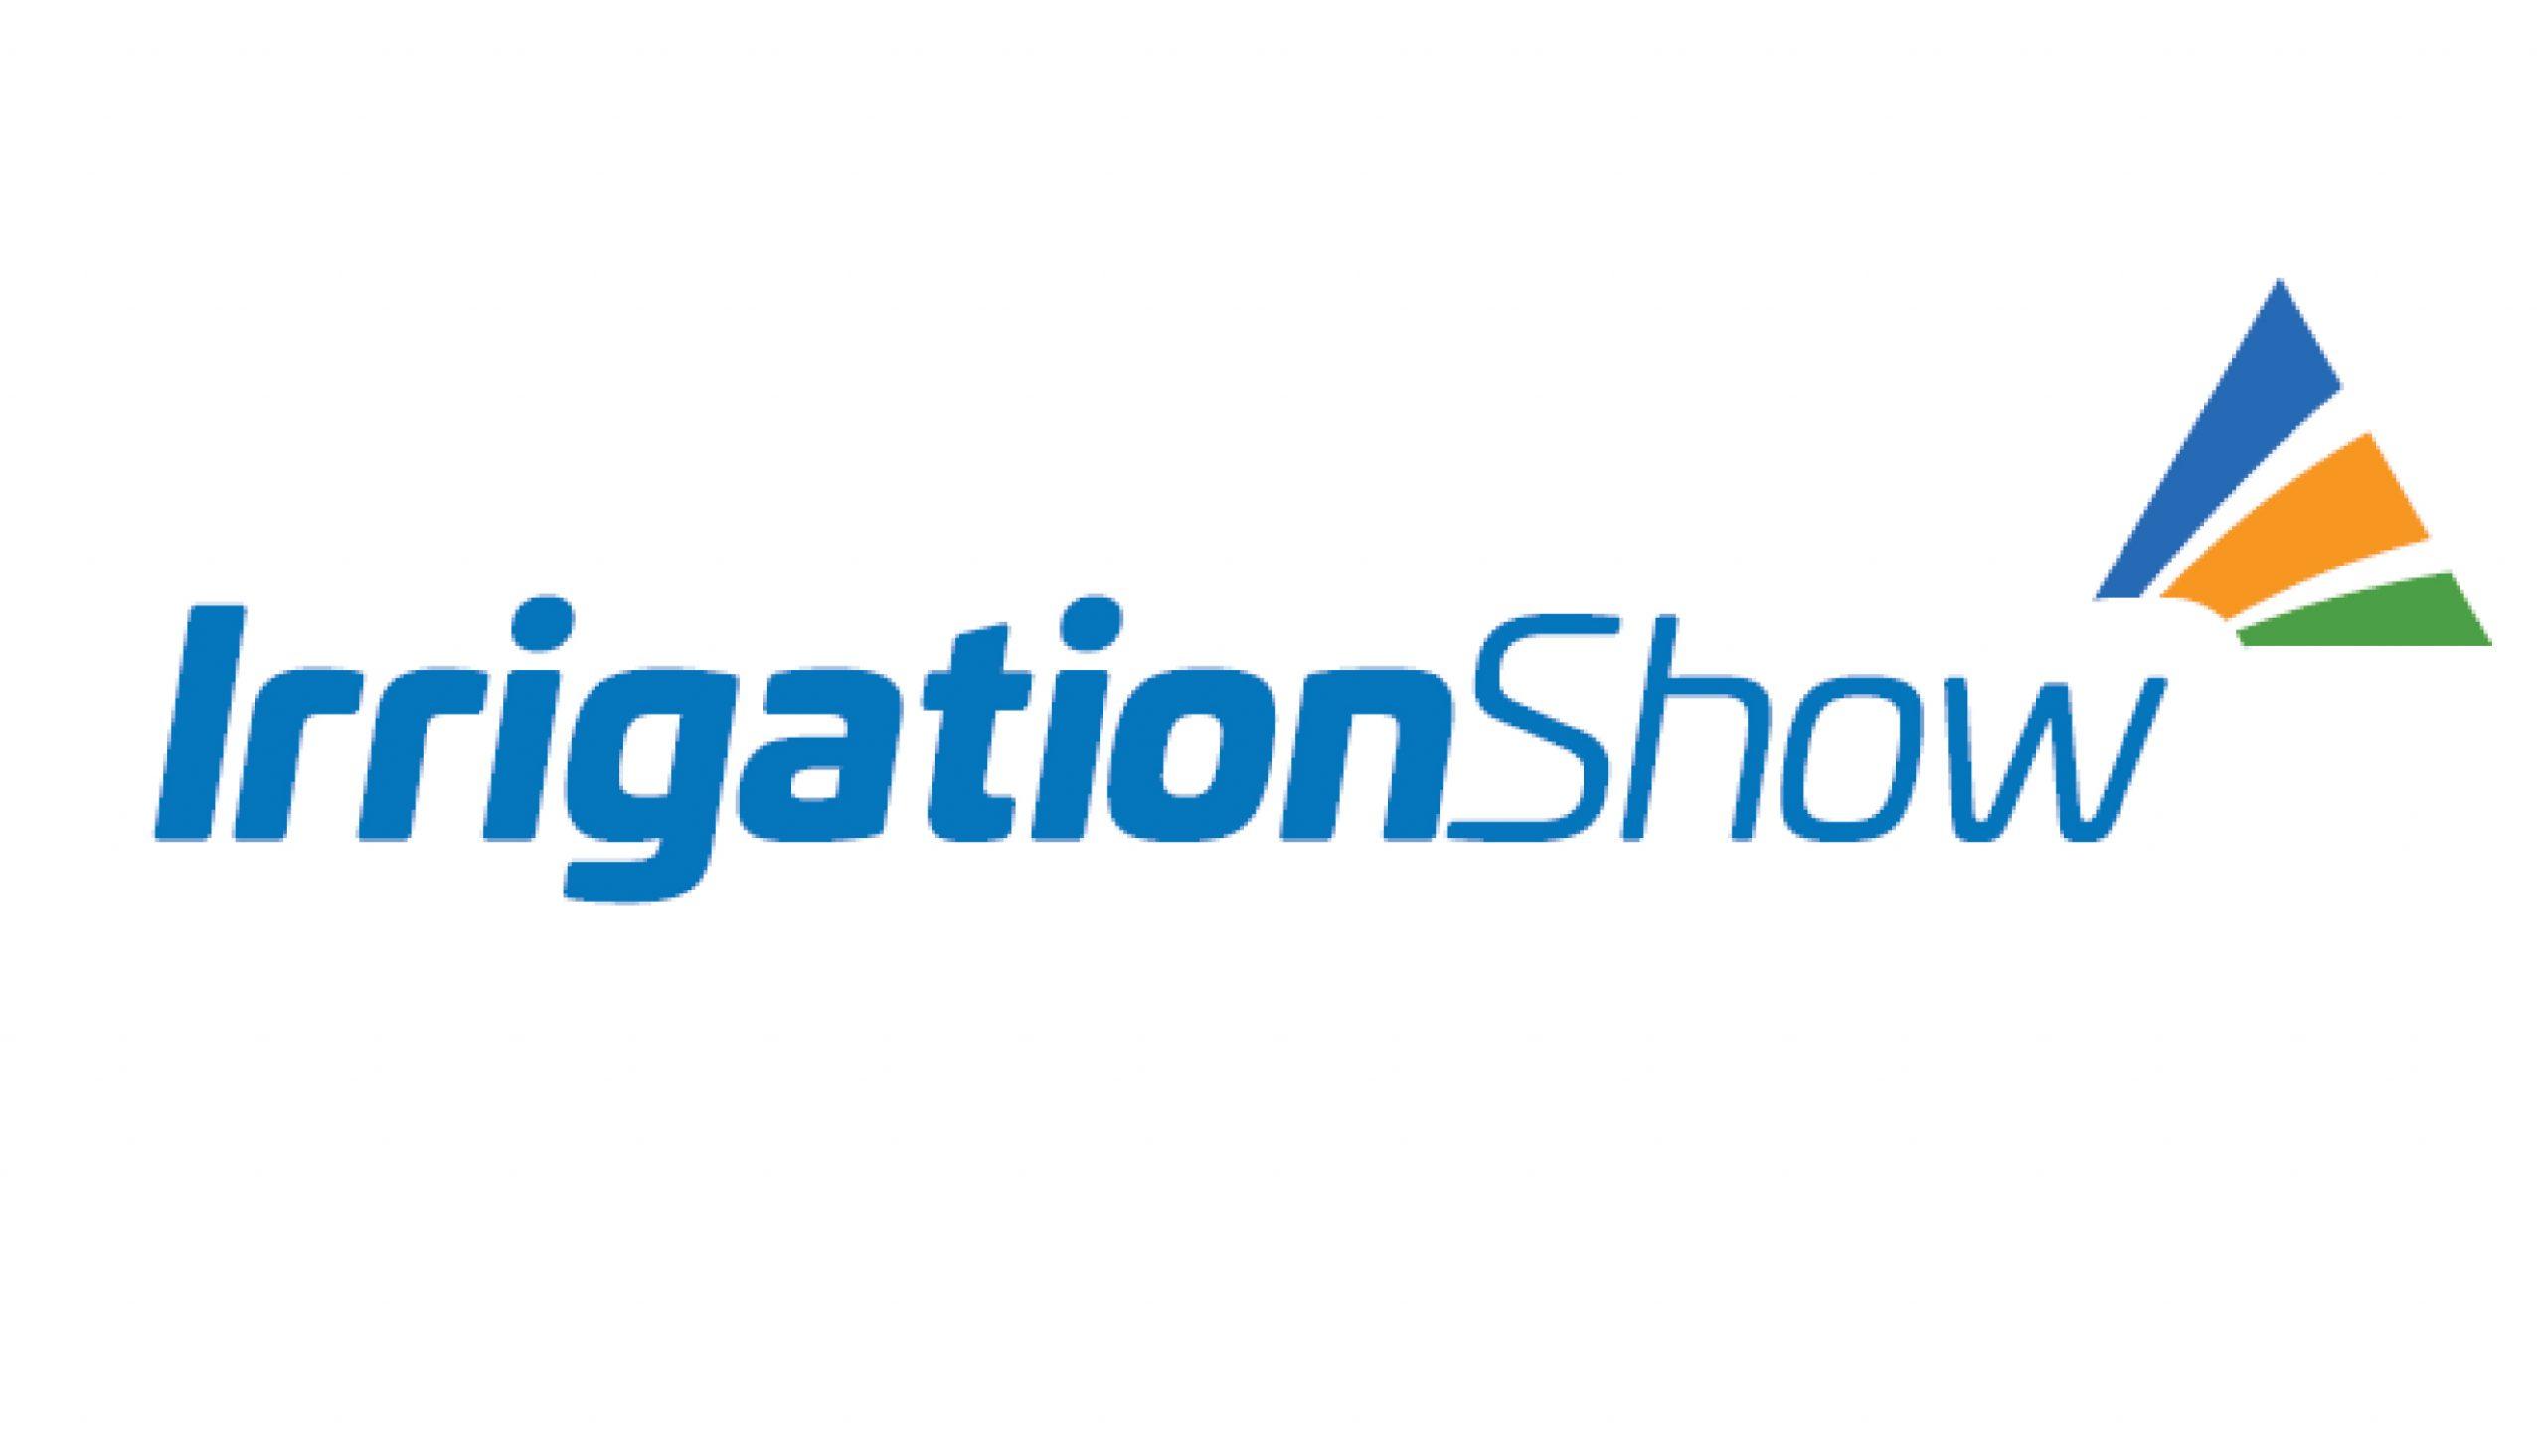 Irrigation Show